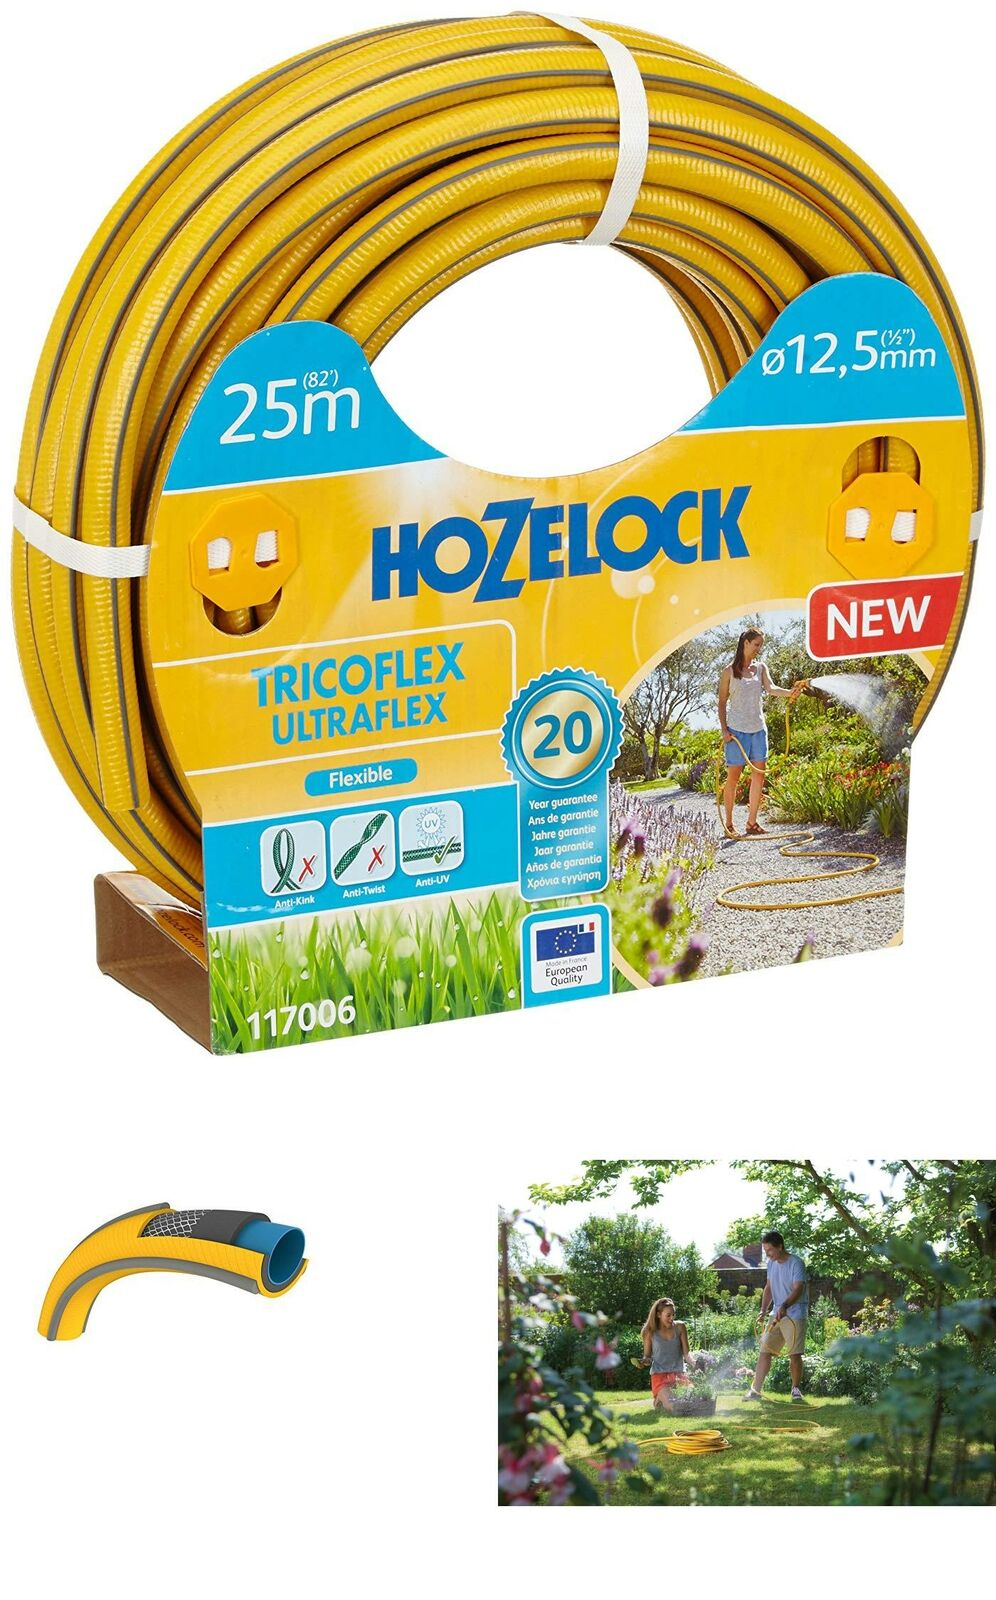 HOZELOCK Tricoflex Ultraflex Tubo flessibile, Giallo, 12.5 mm x 25 M